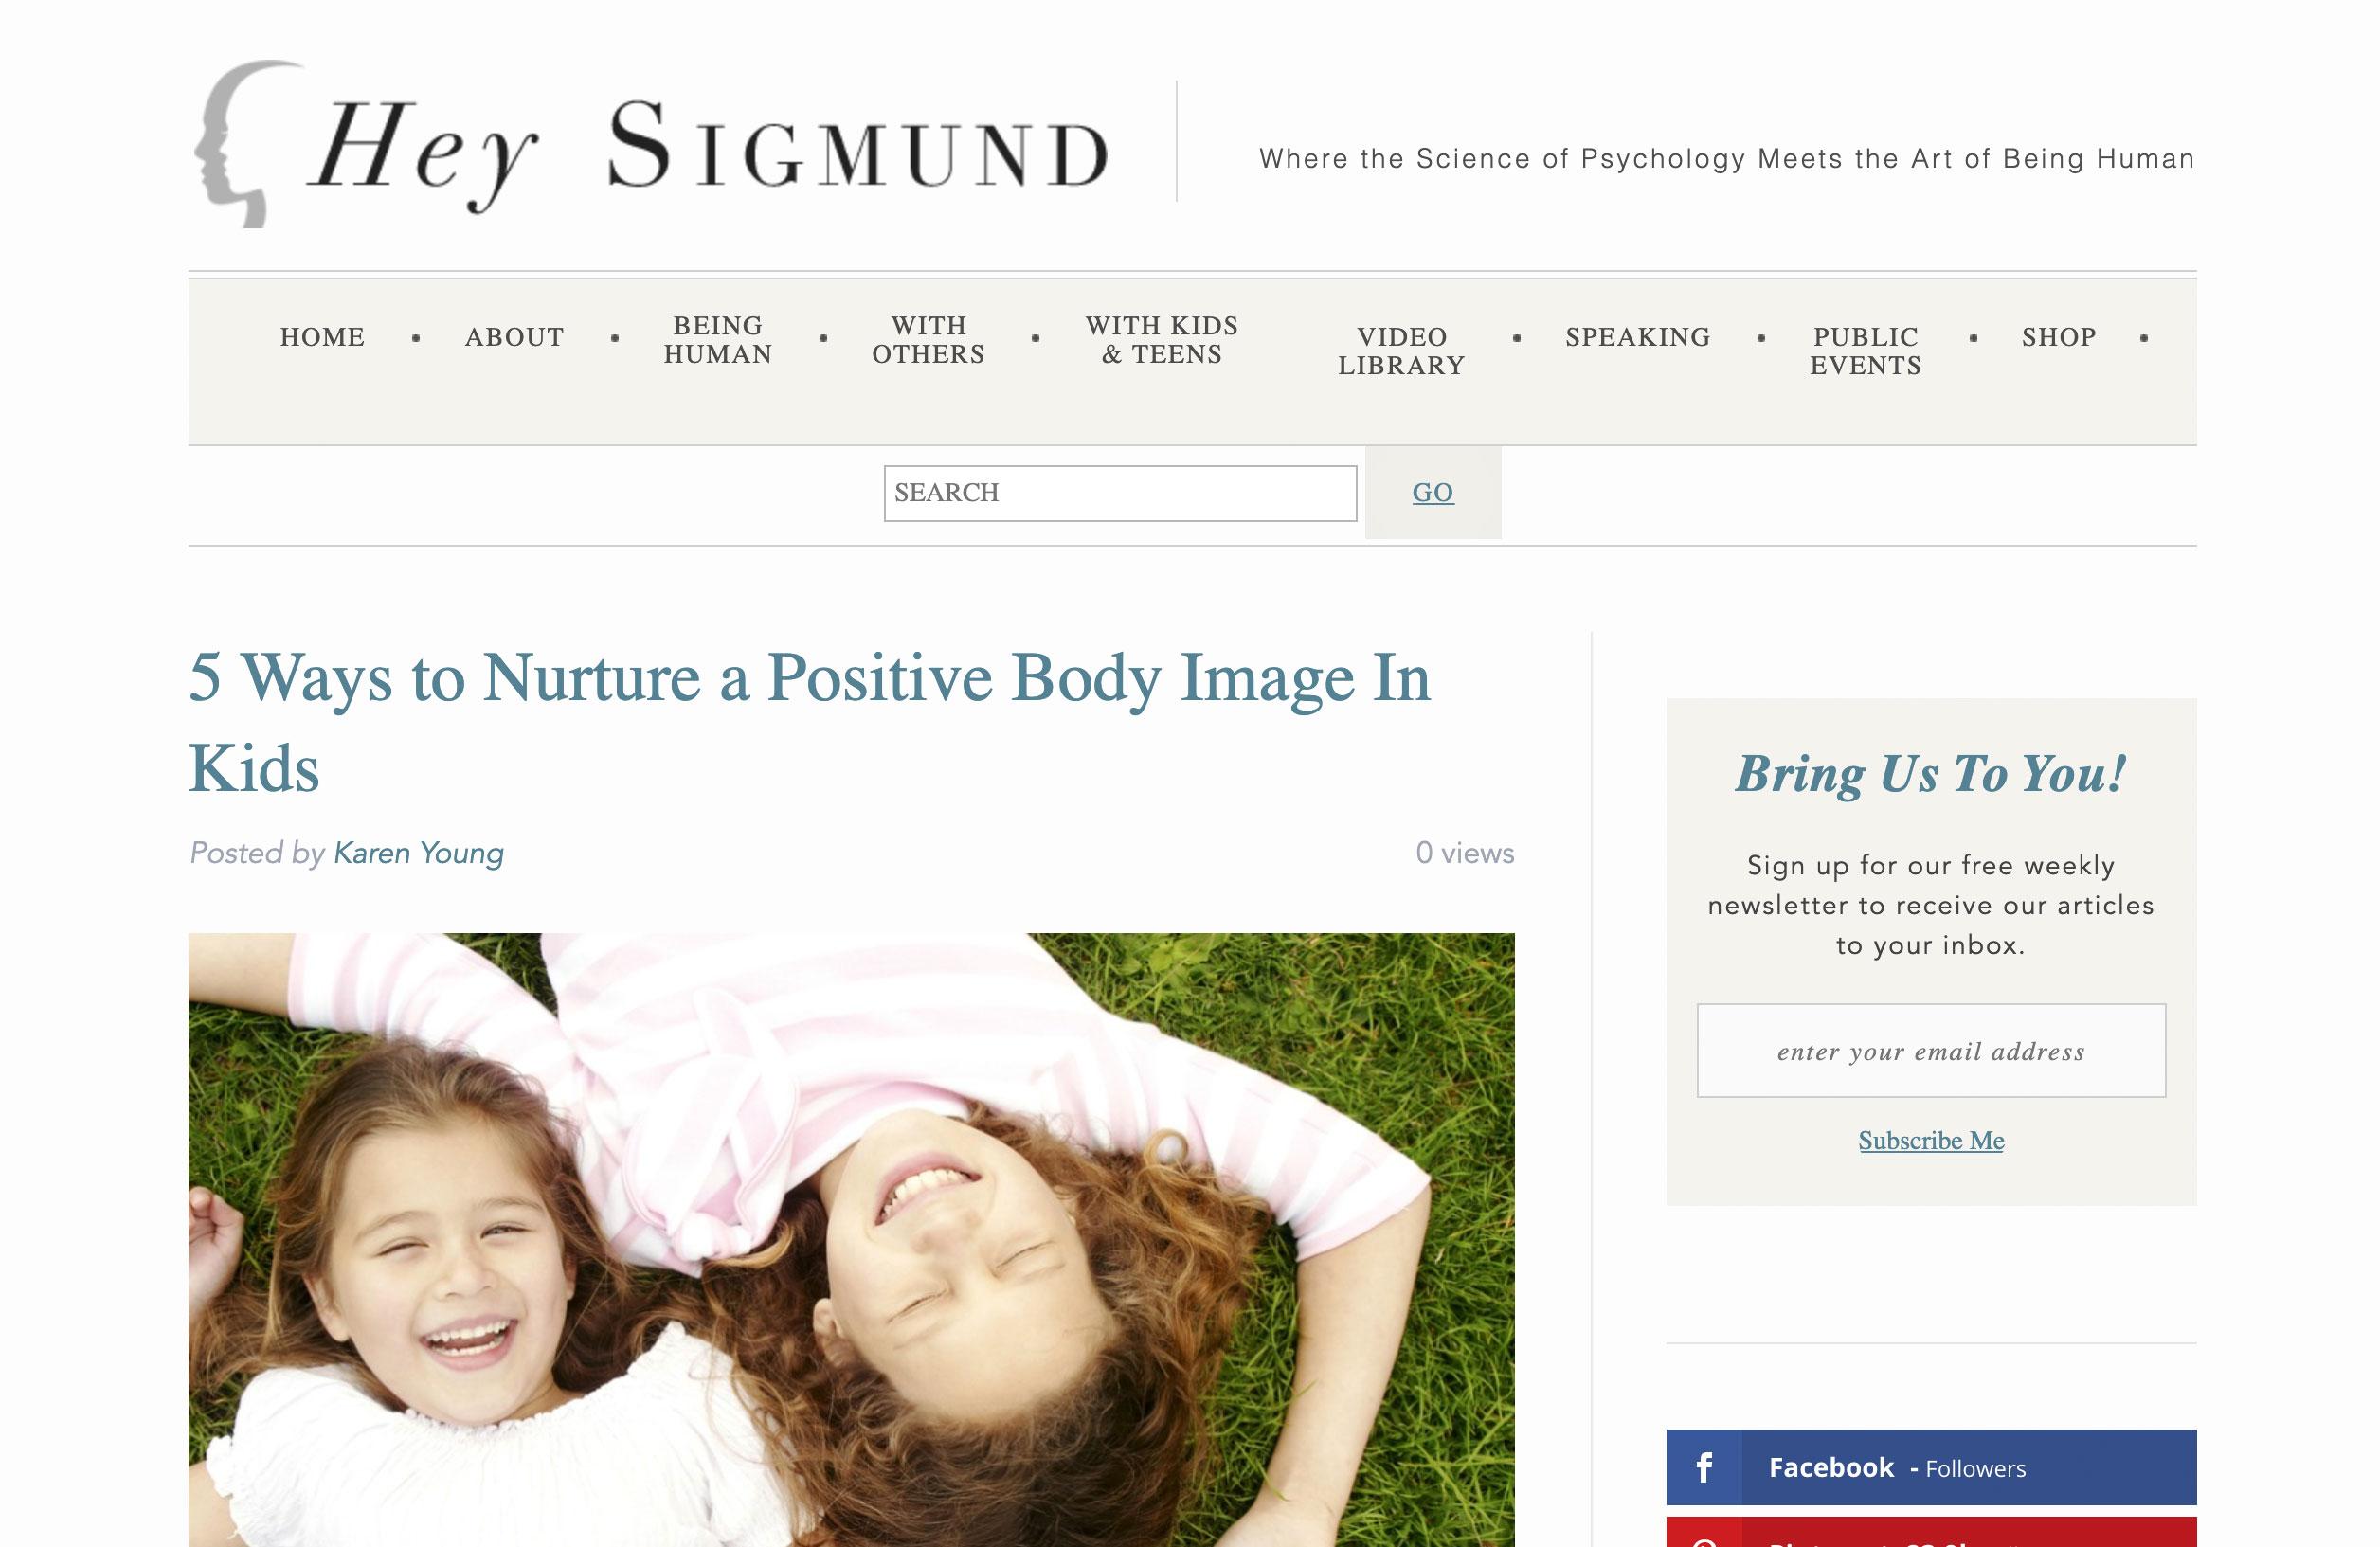 5 Ways to Nurture a Positive Body Image In Kids